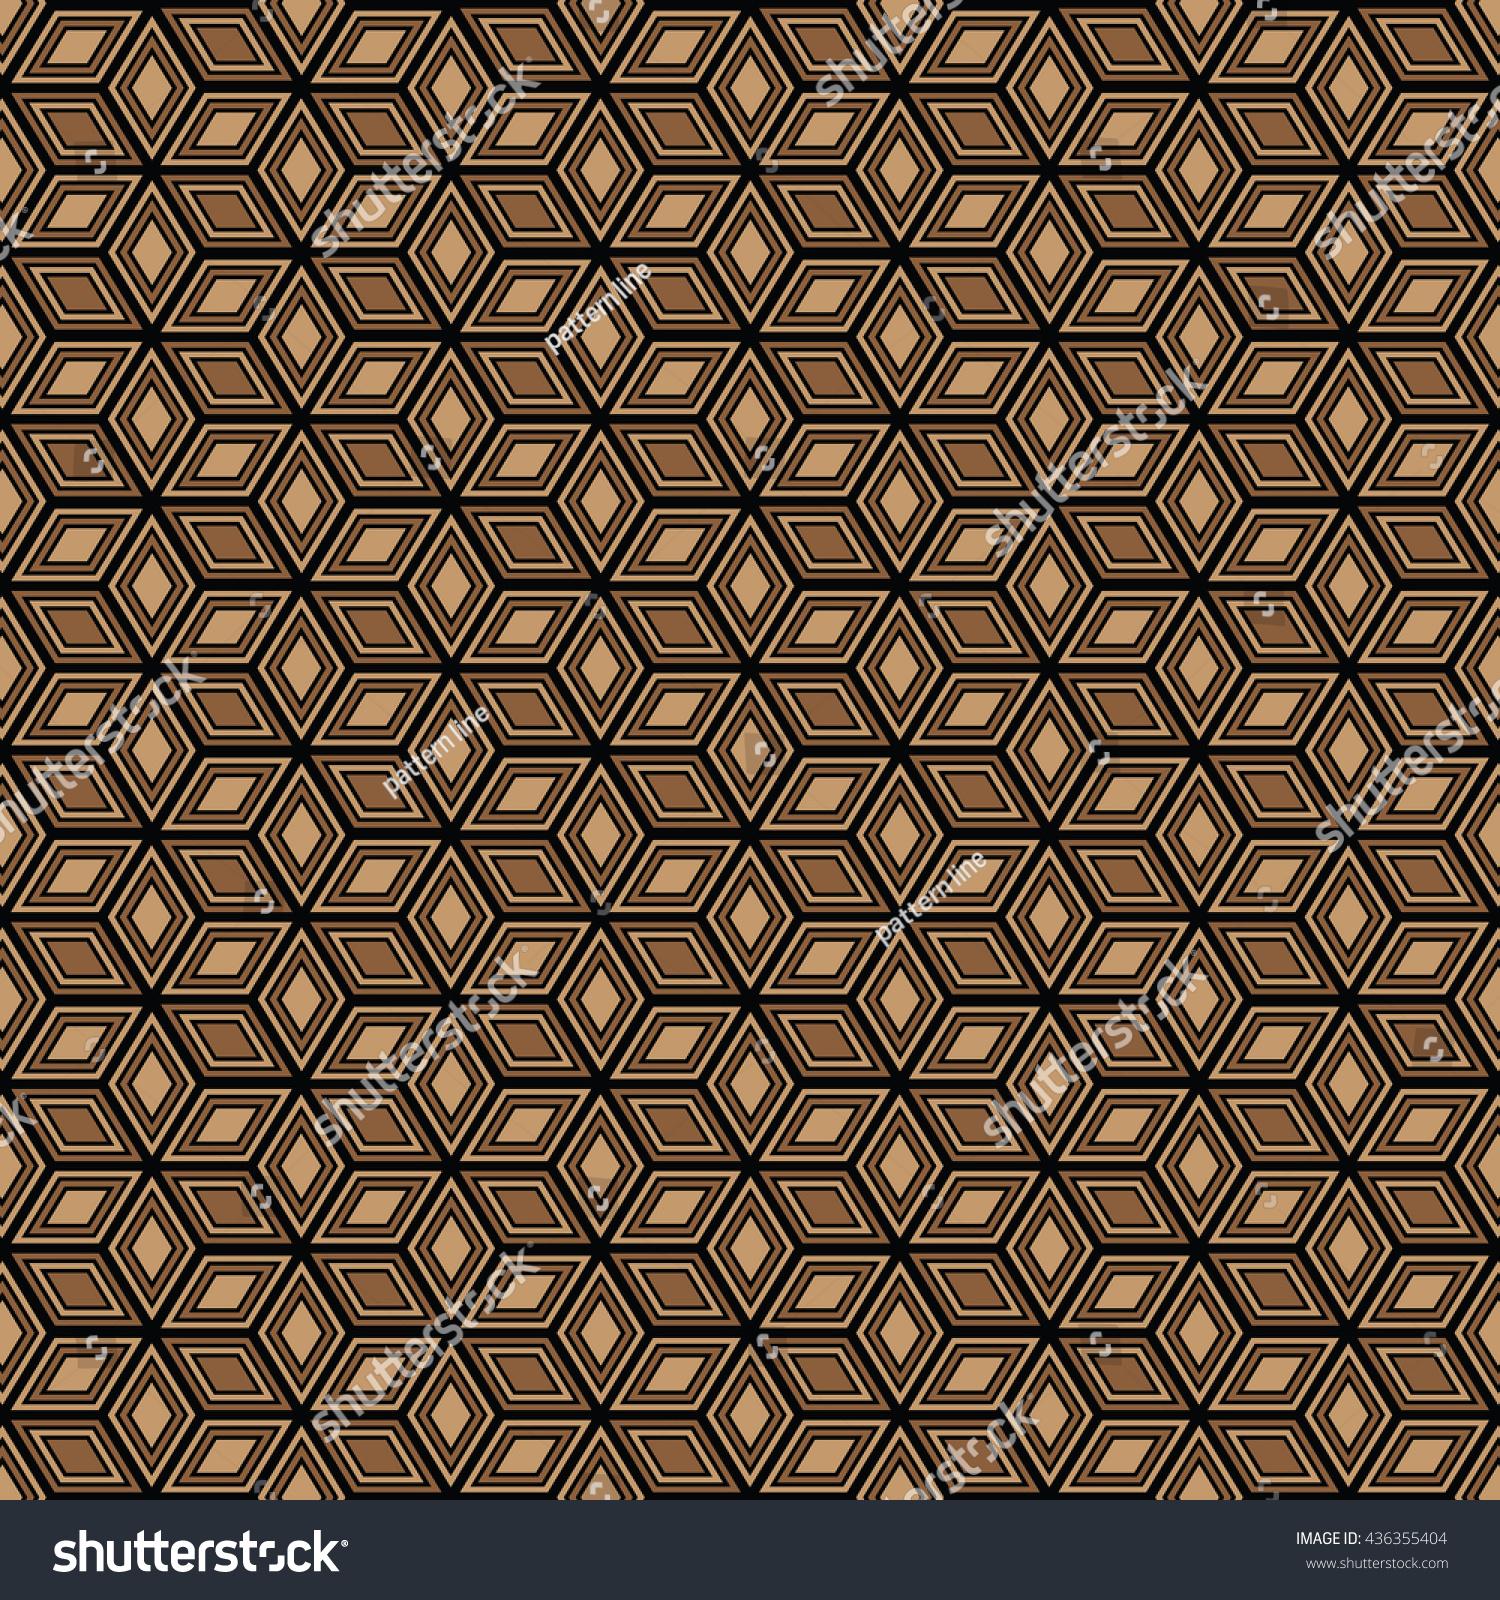 Line Texture Vector : Vector seamless pattern background line geometricmodern